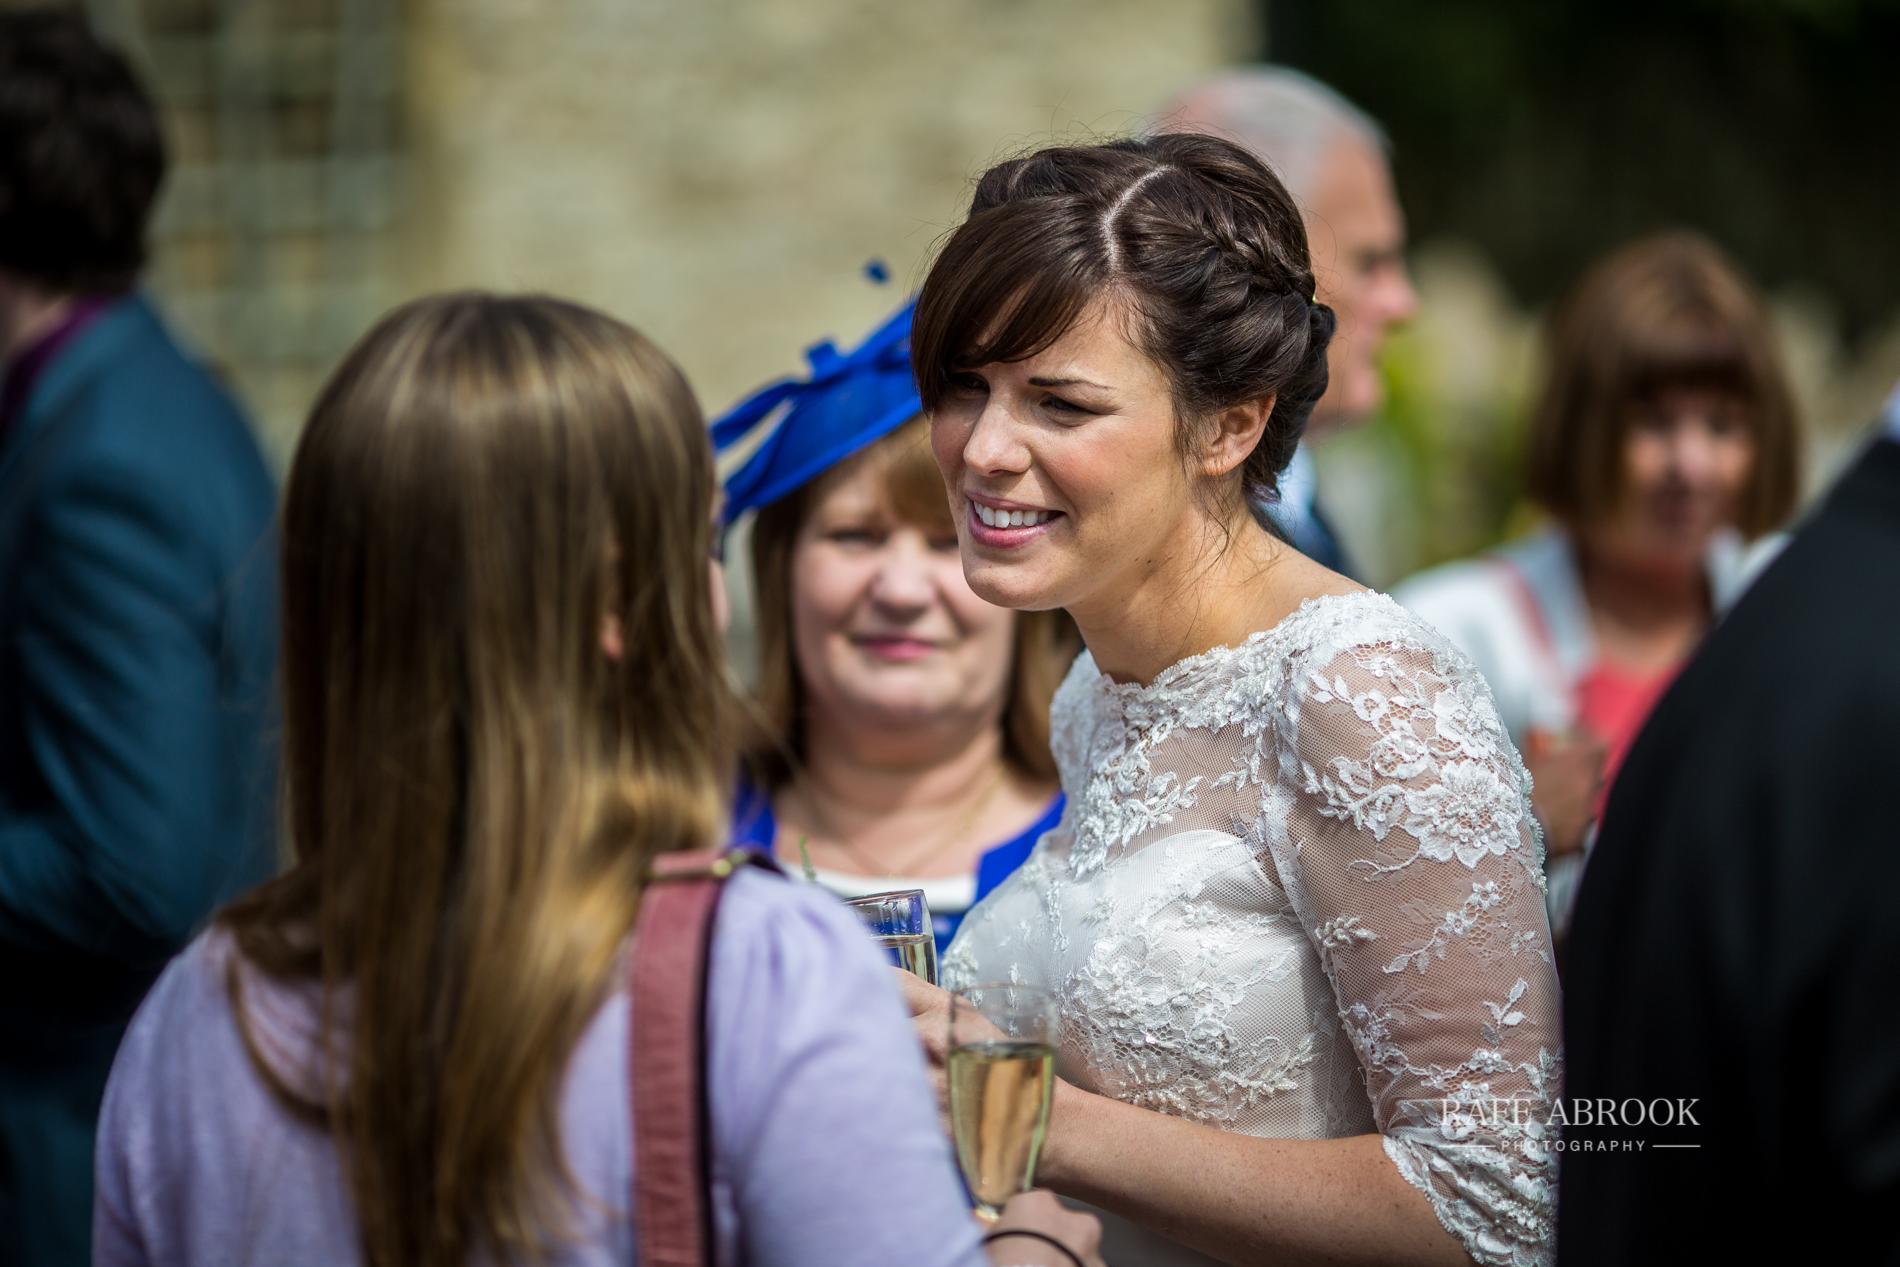 jon & laura wedding notley tythe barn wedding buckinghamshire-1227.jpg